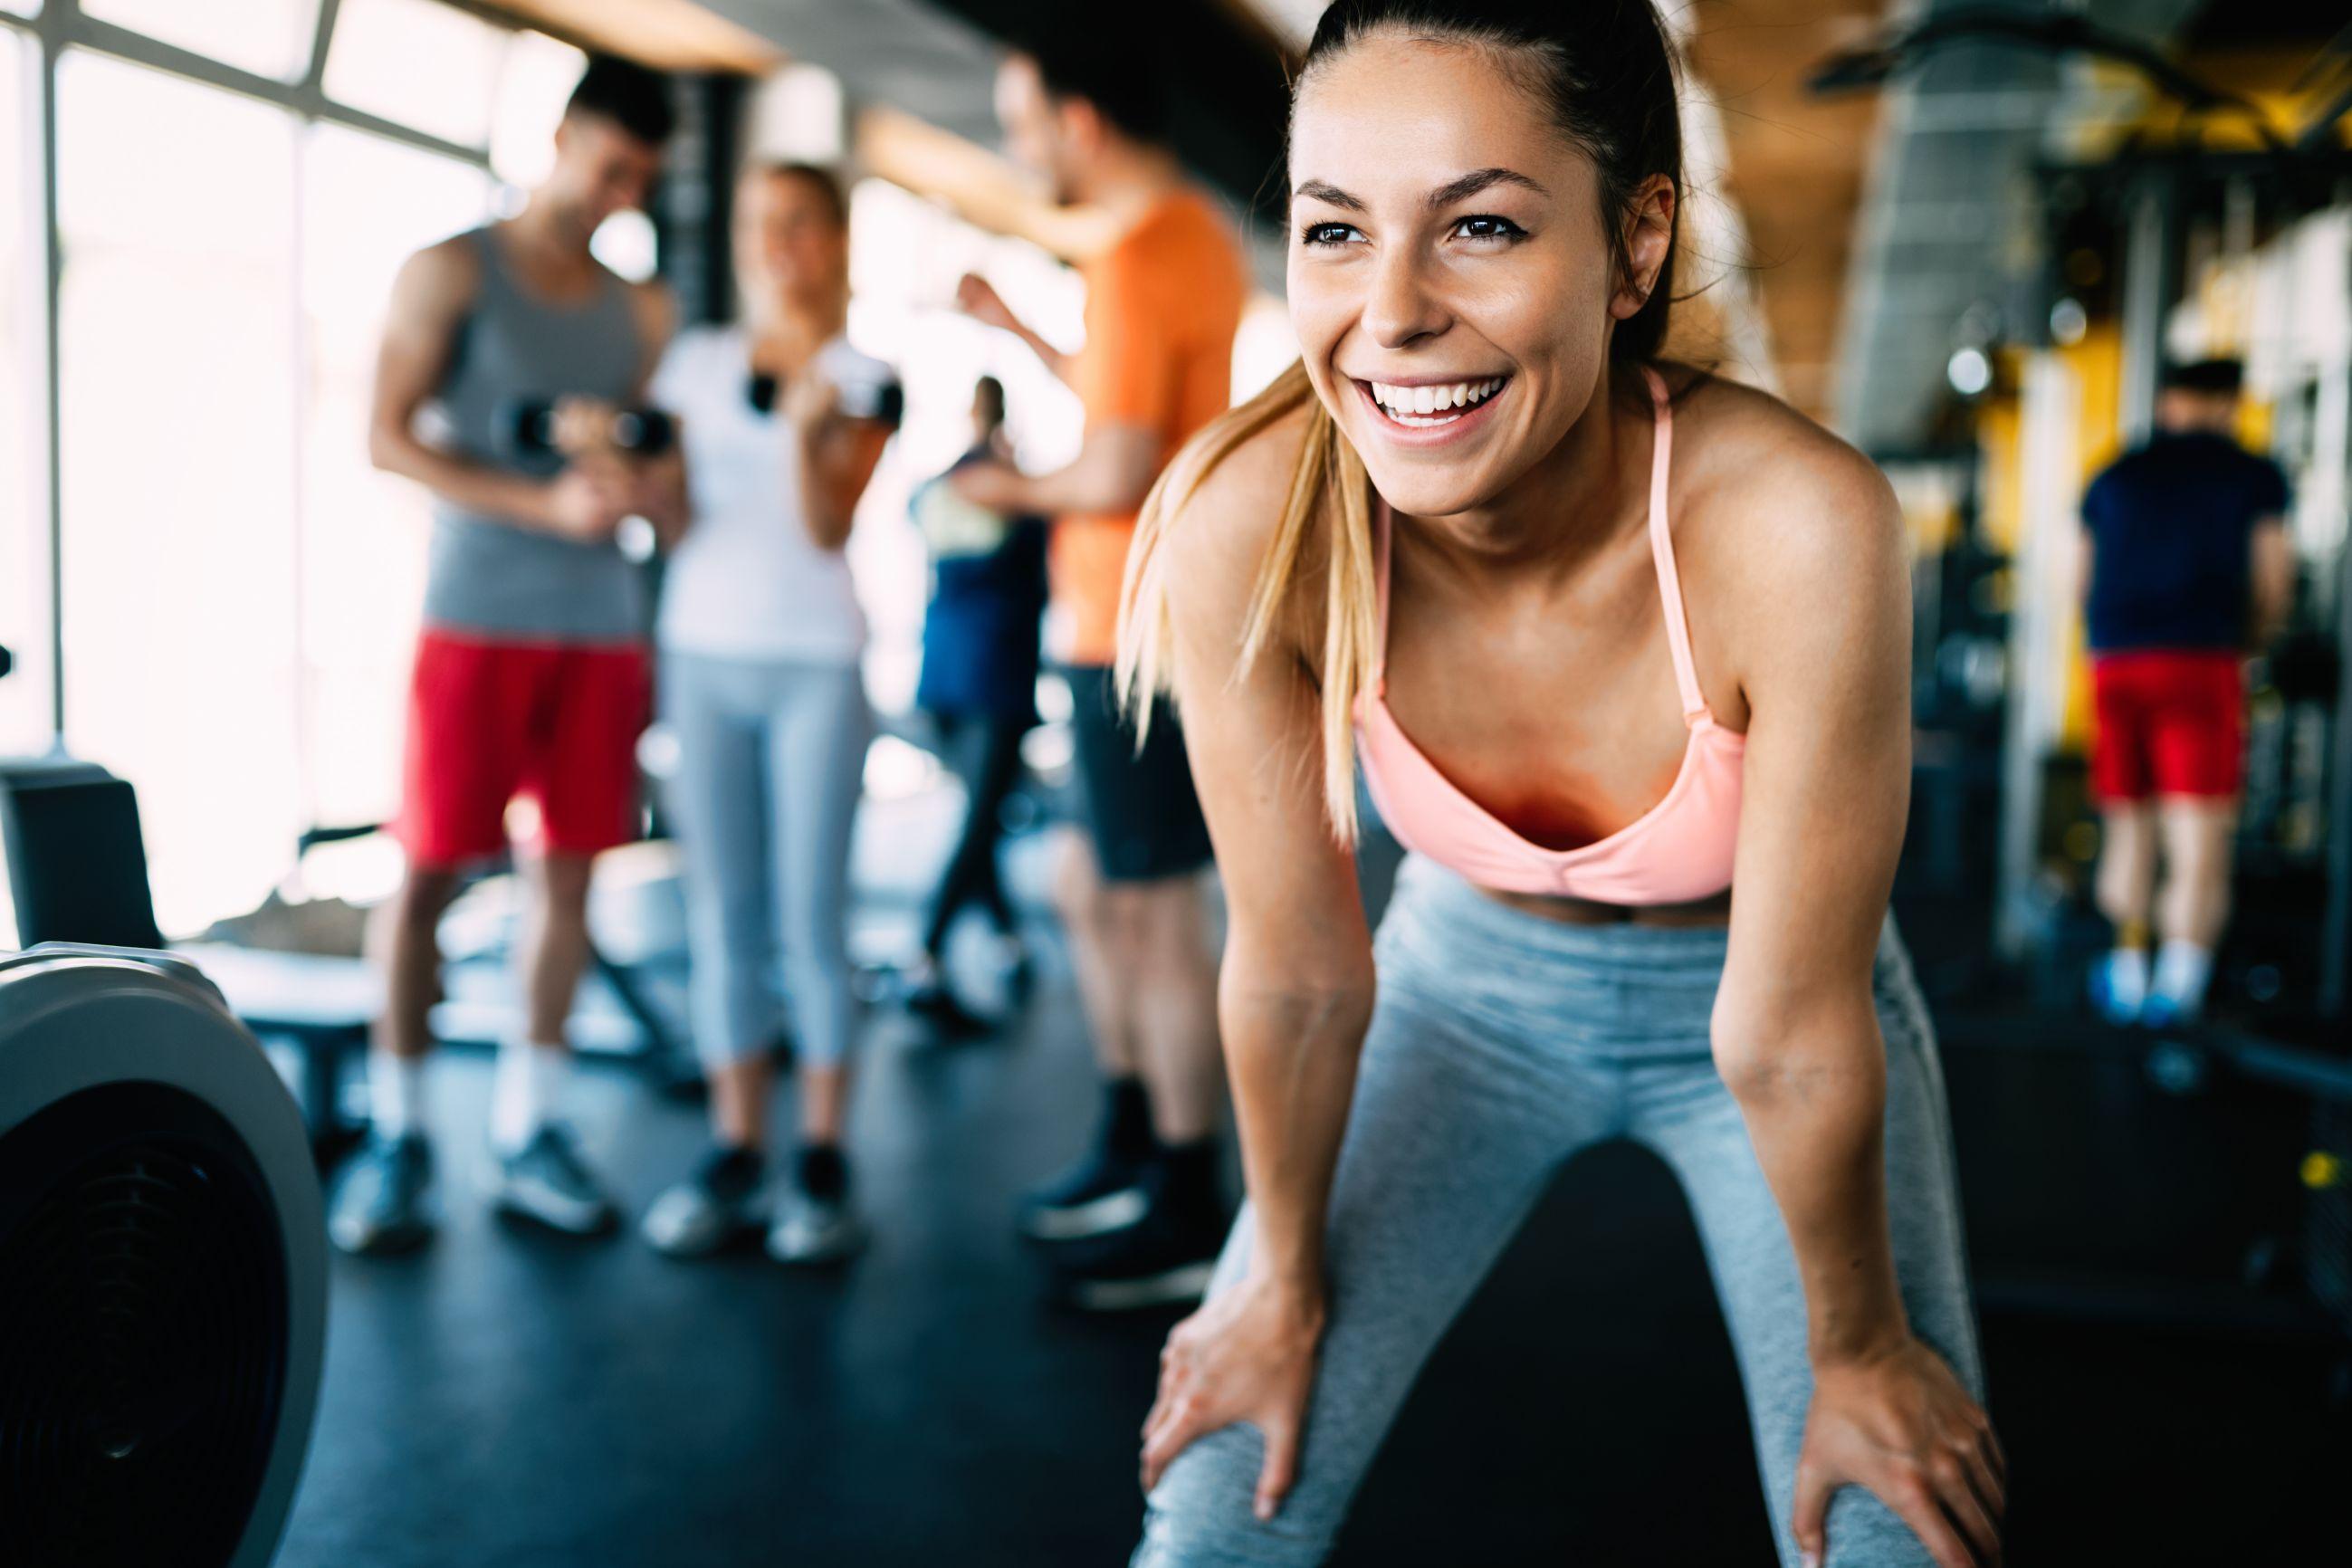 Fitness - Gym